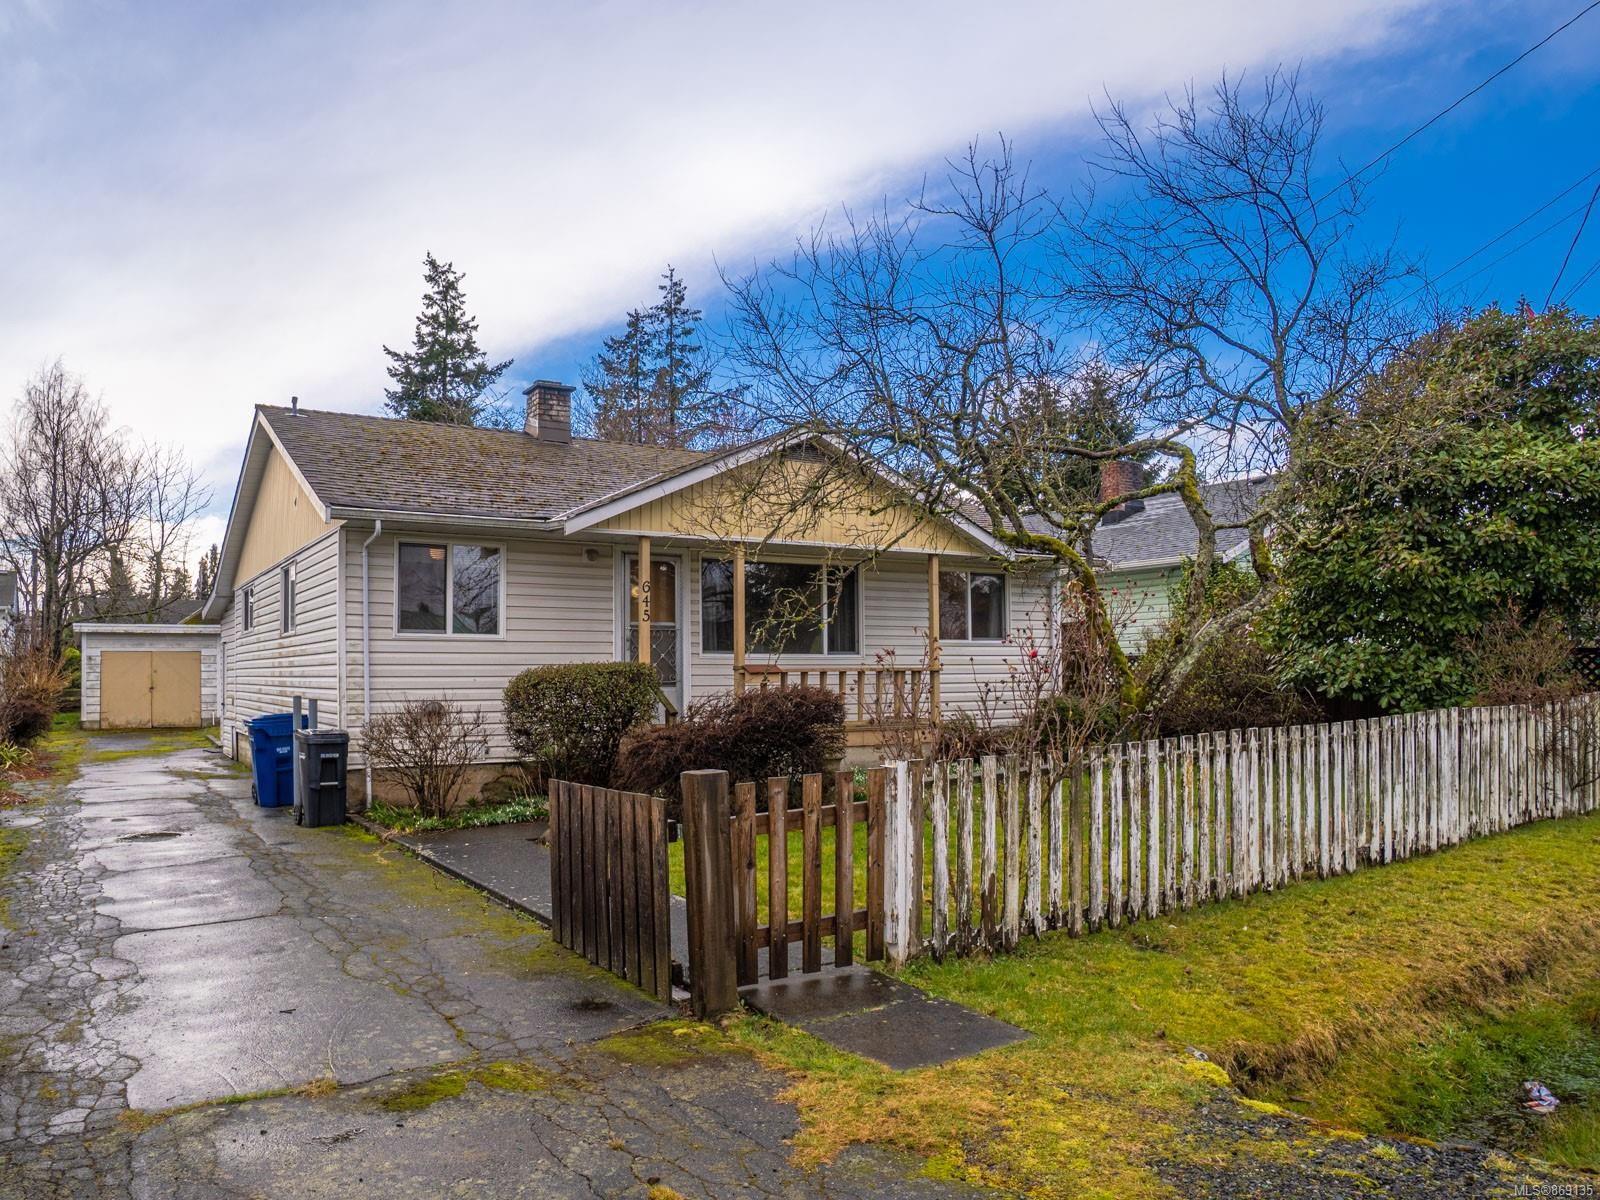 Main Photo: 645 Cadogan St in : Na Central Nanaimo House for sale (Nanaimo)  : MLS®# 869135